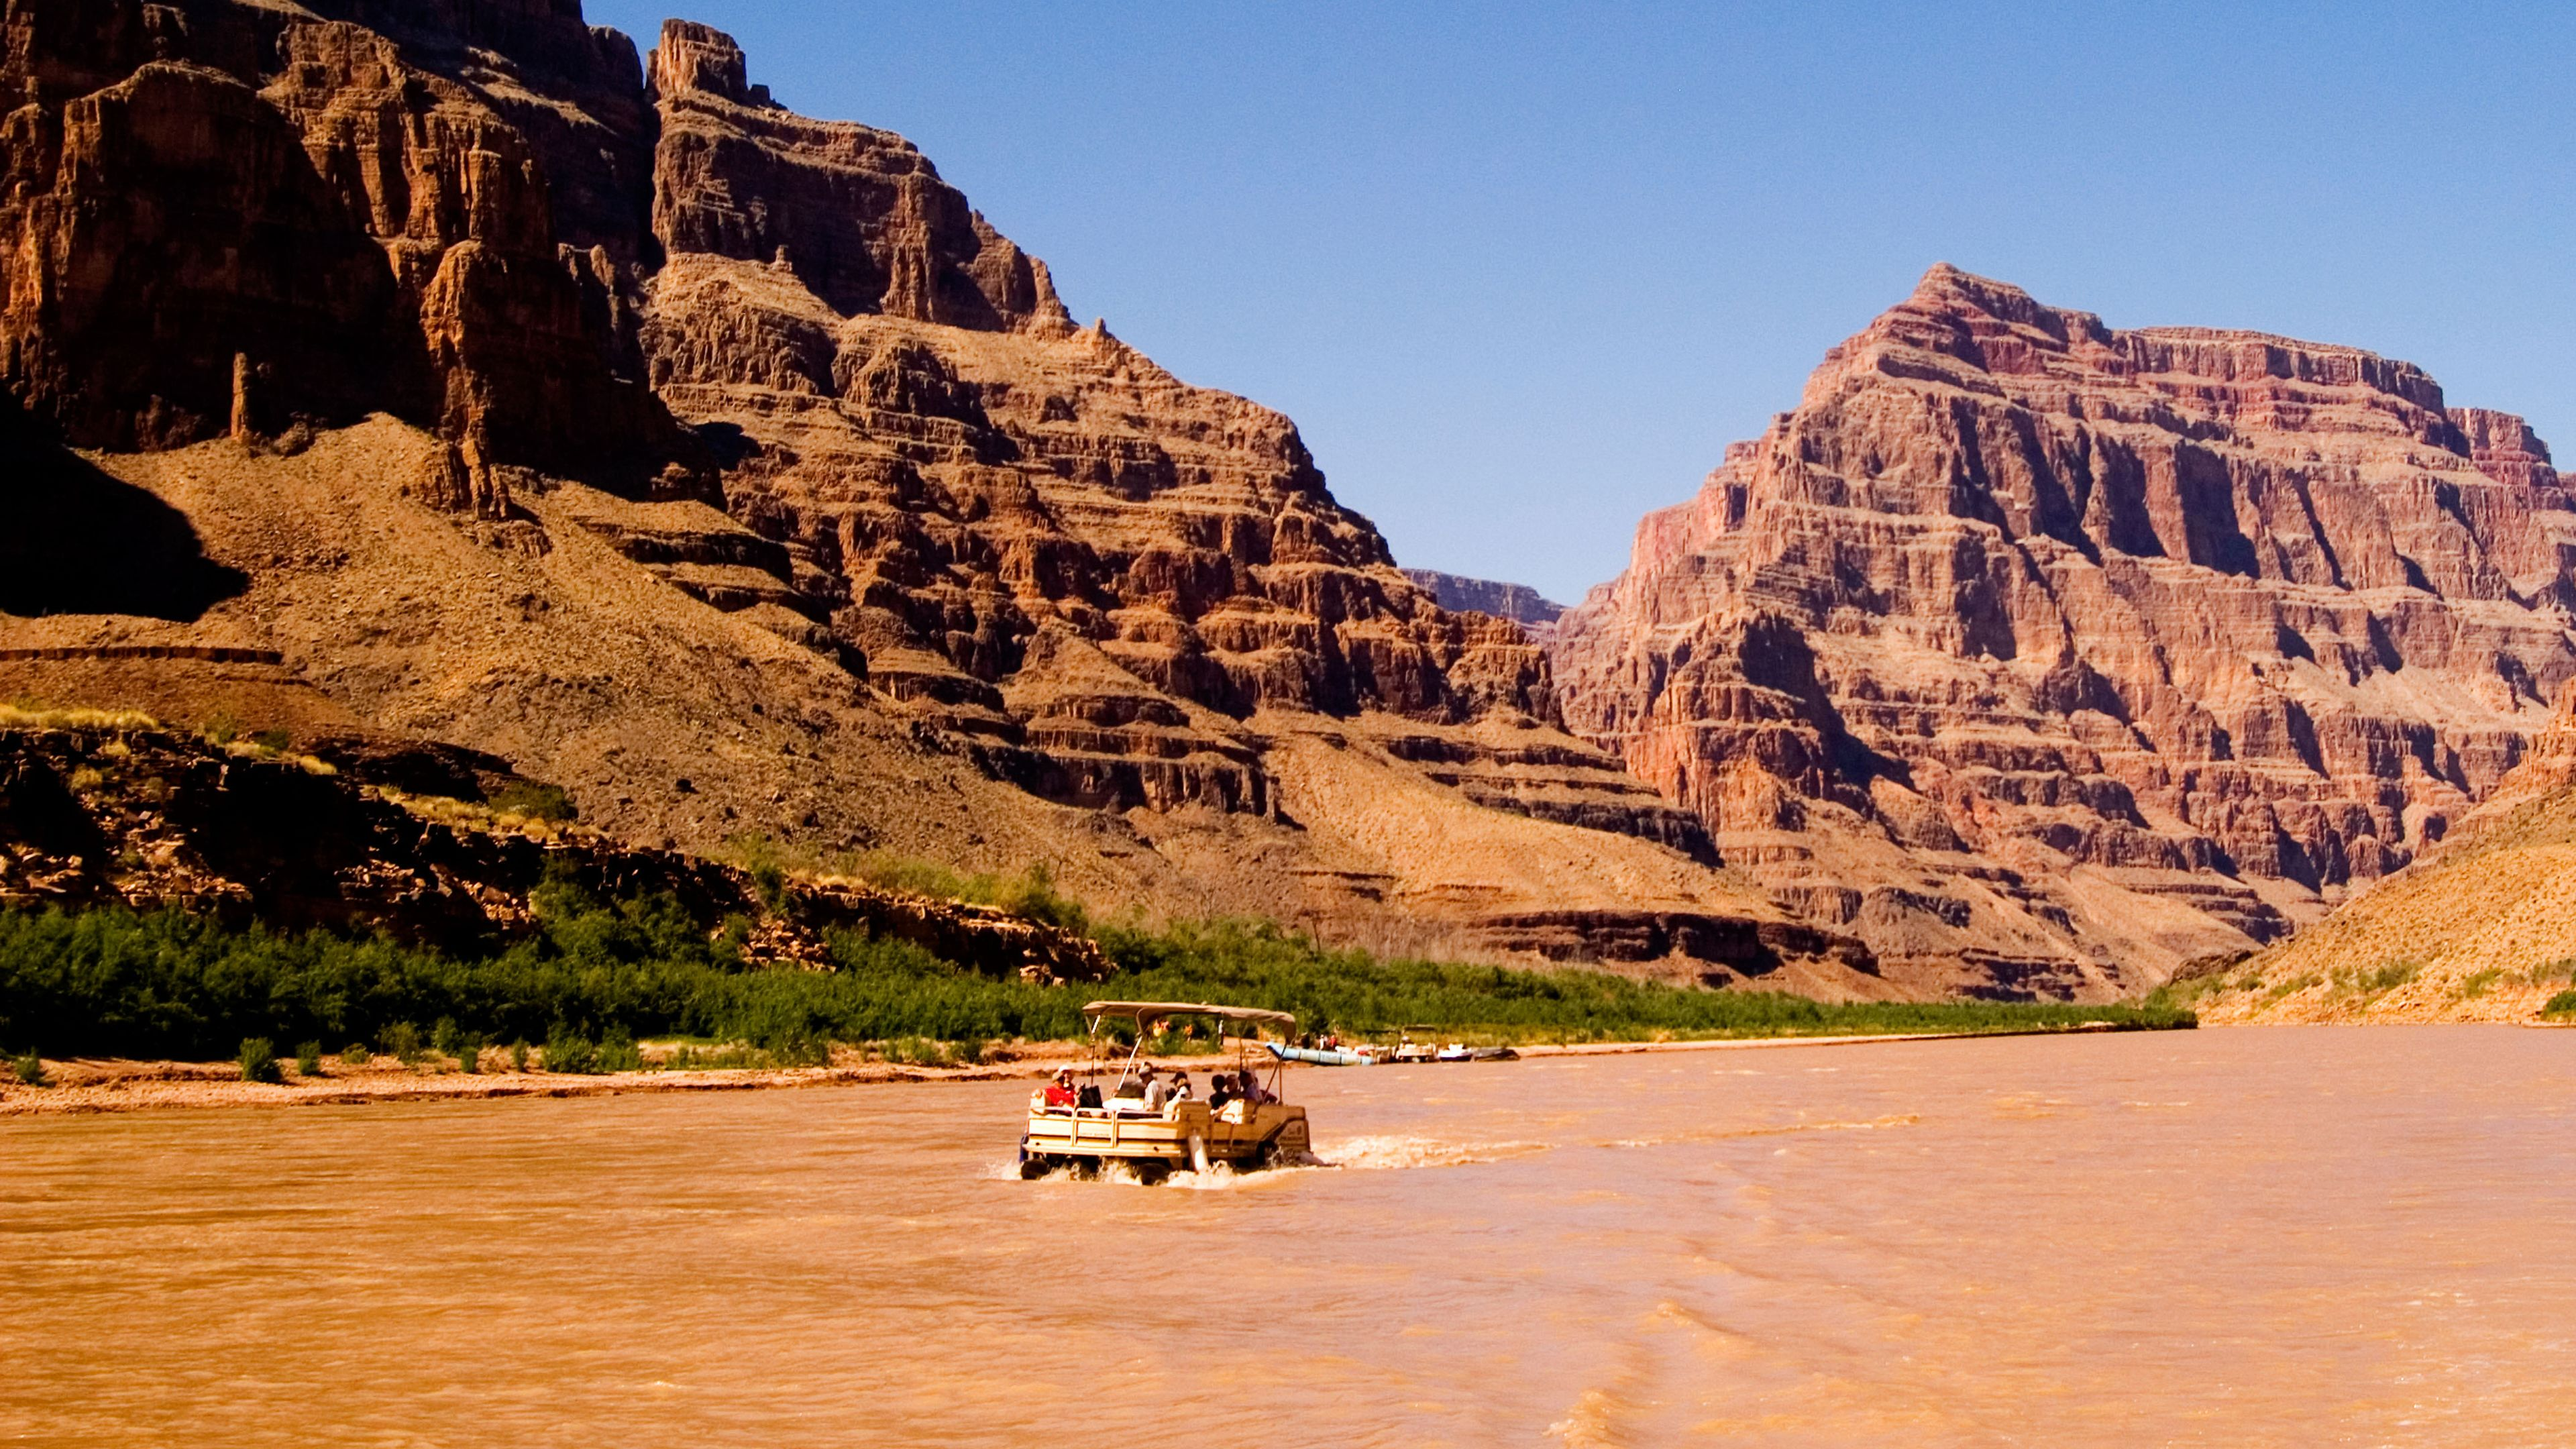 Scenic Grand Canyon Boat Trip Boating pontoon boat on Colorado River Arizona AZ